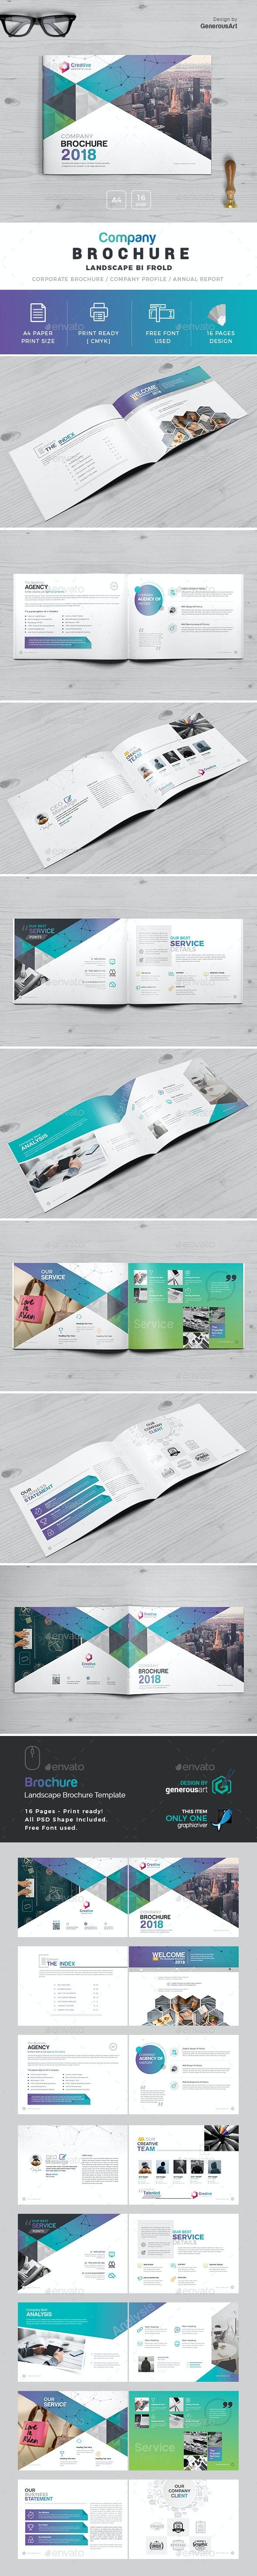 Company Landscape Brochure - Corporate Brochures